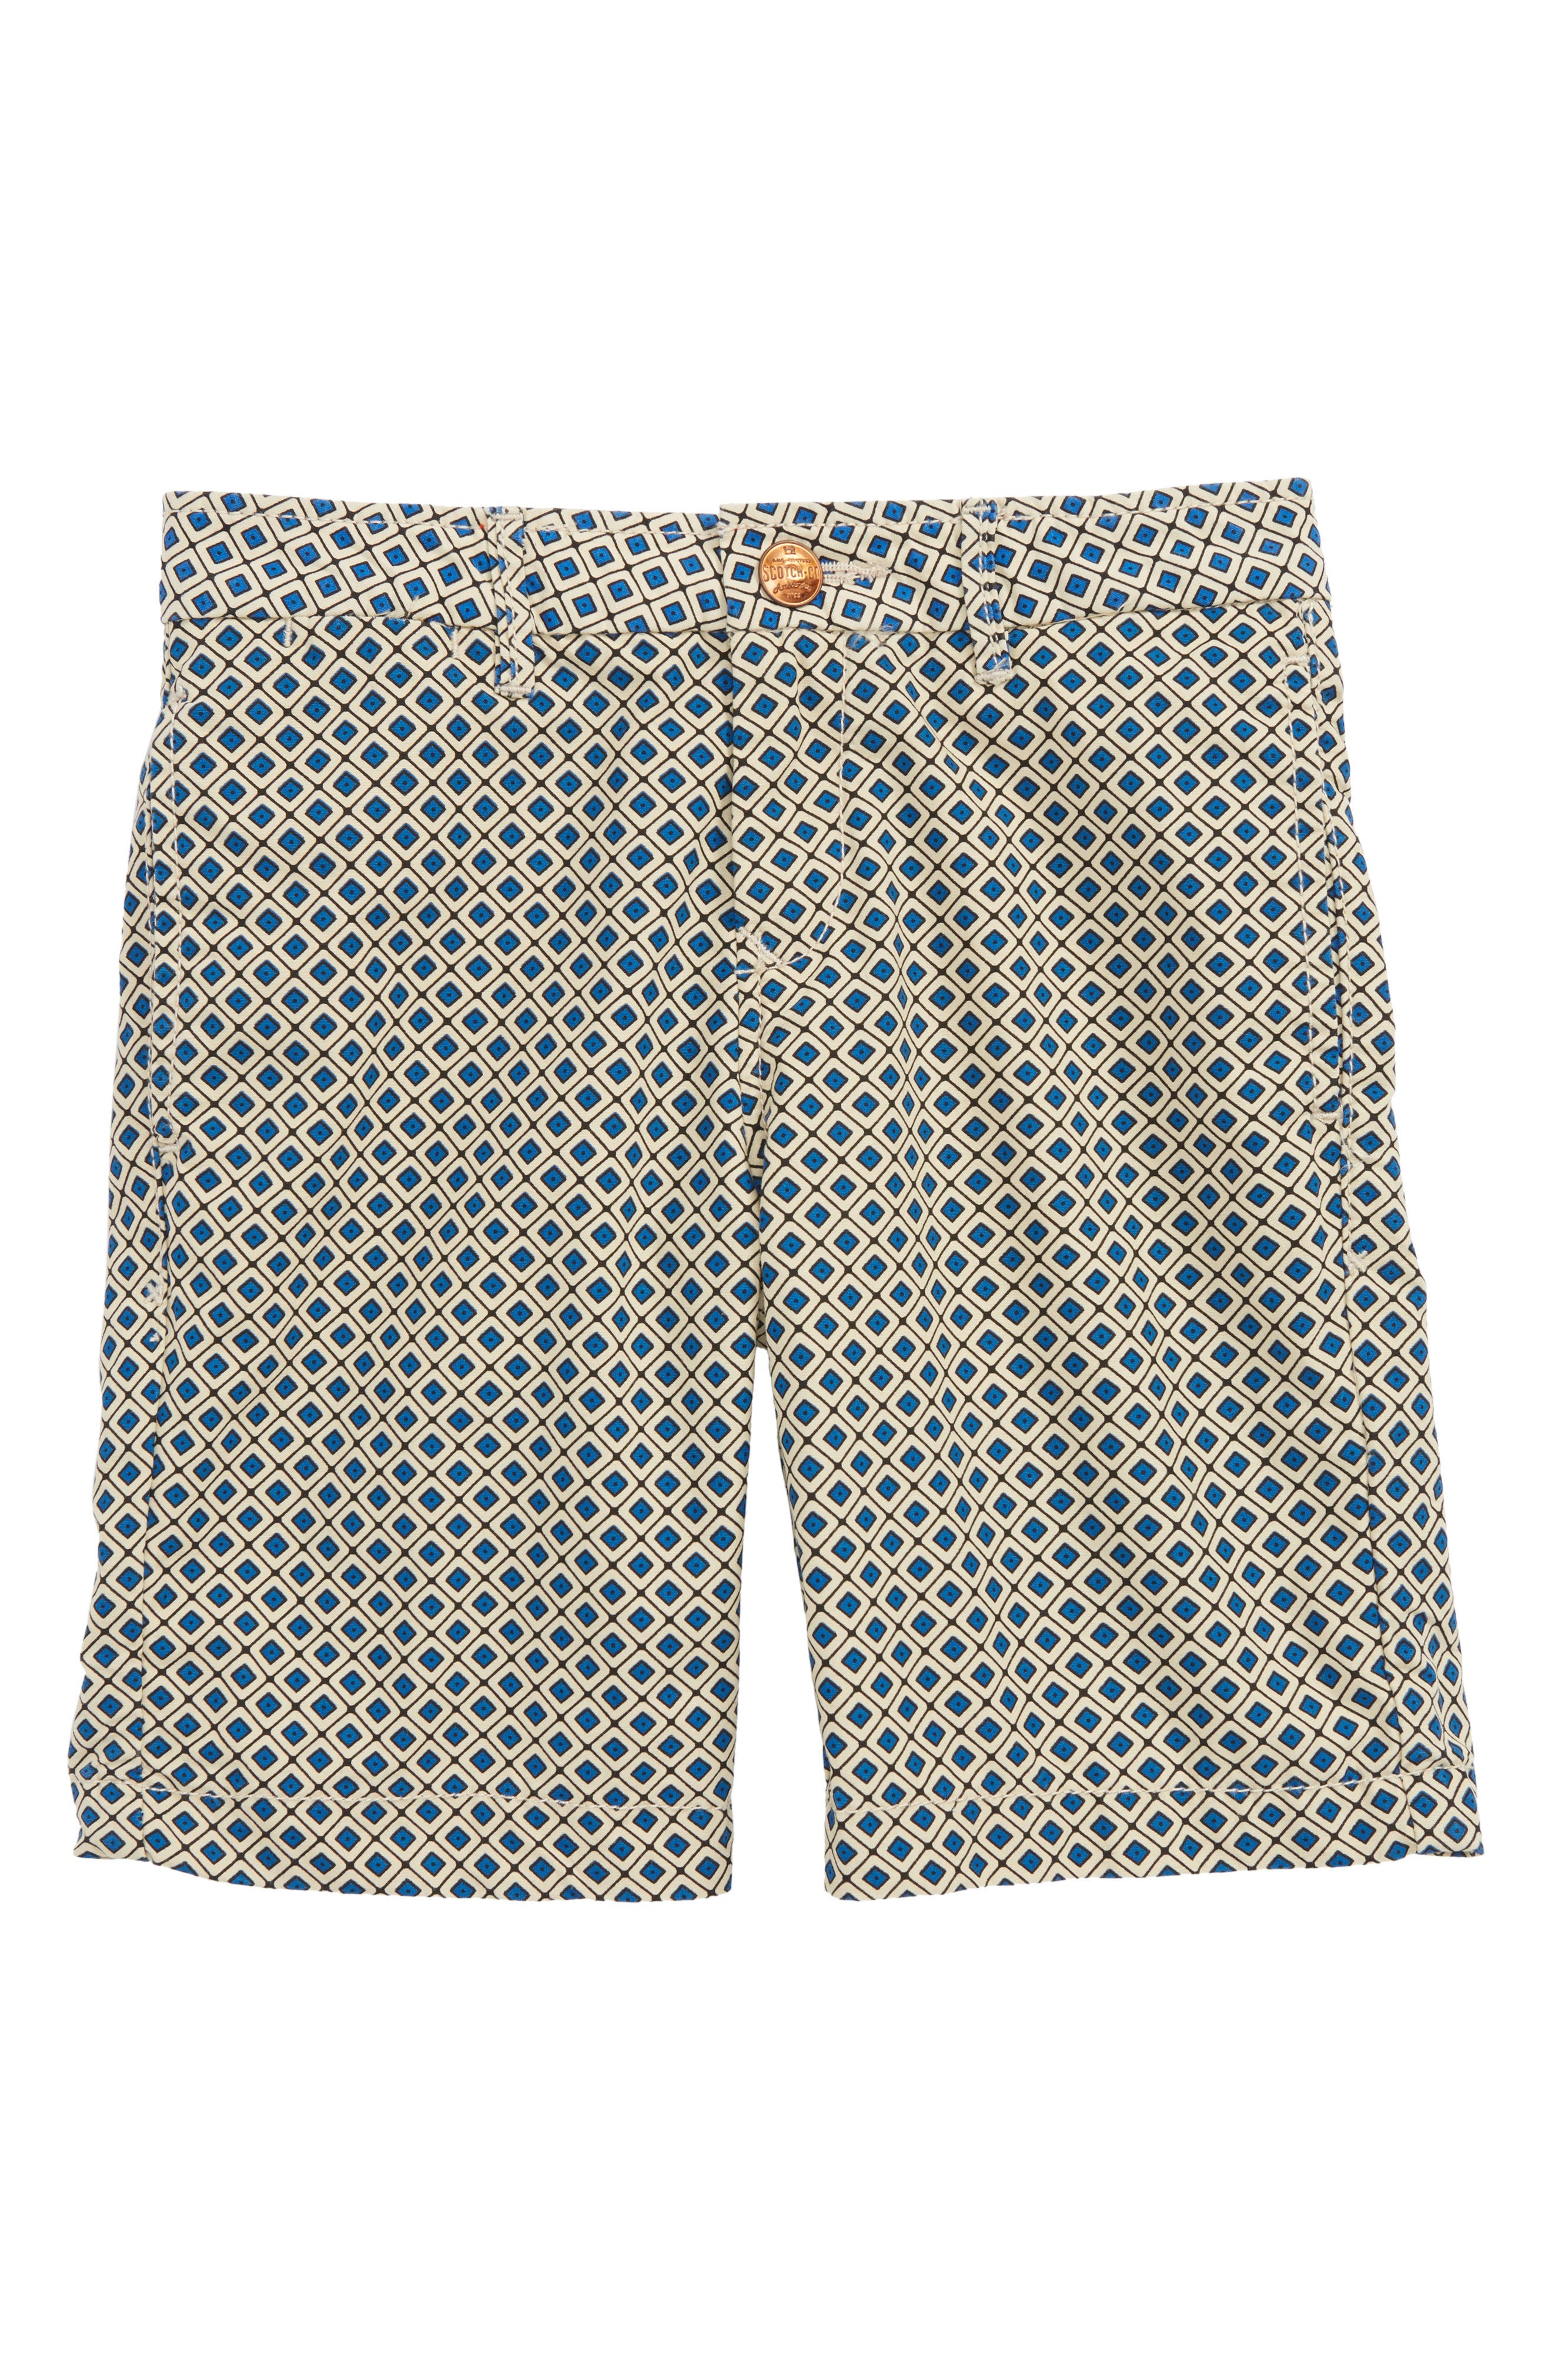 Poplin Shorts,                             Main thumbnail 1, color,                             Combo Stripes